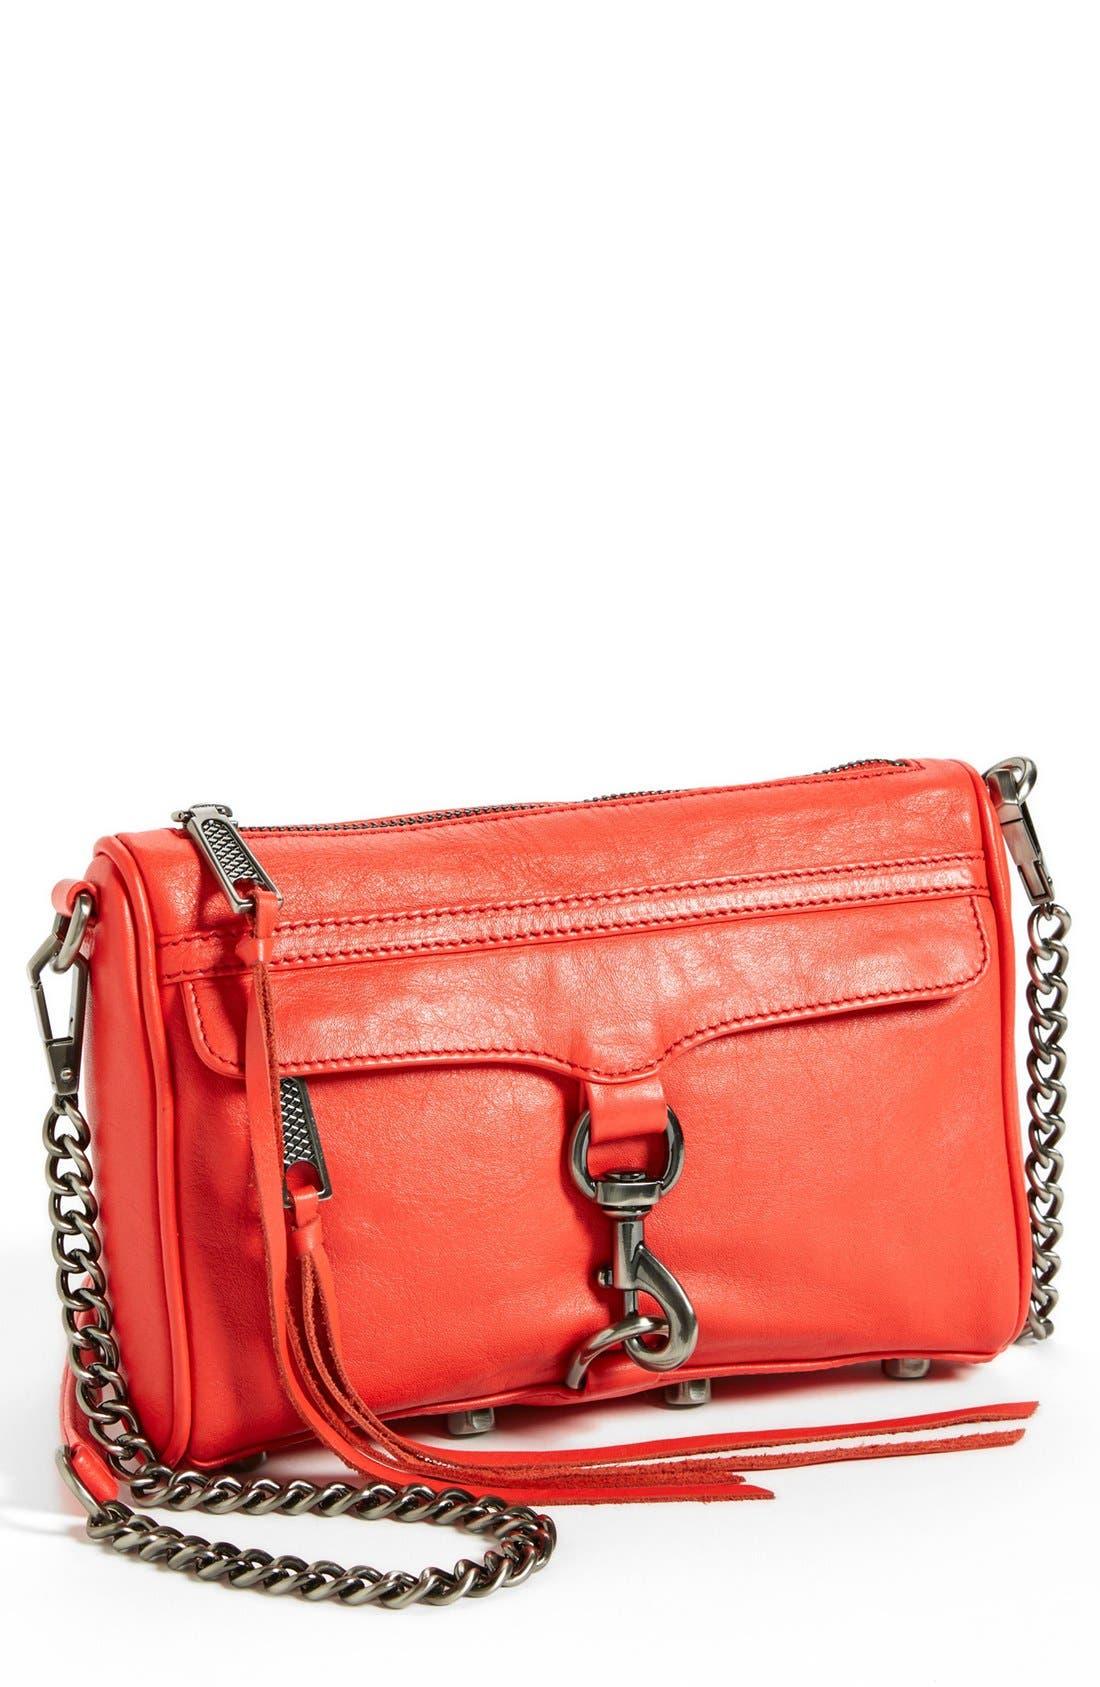 Alternate Image 1 Selected - Rebecca Minkoff 'Mini MAC' Leather Crossbody Clutch